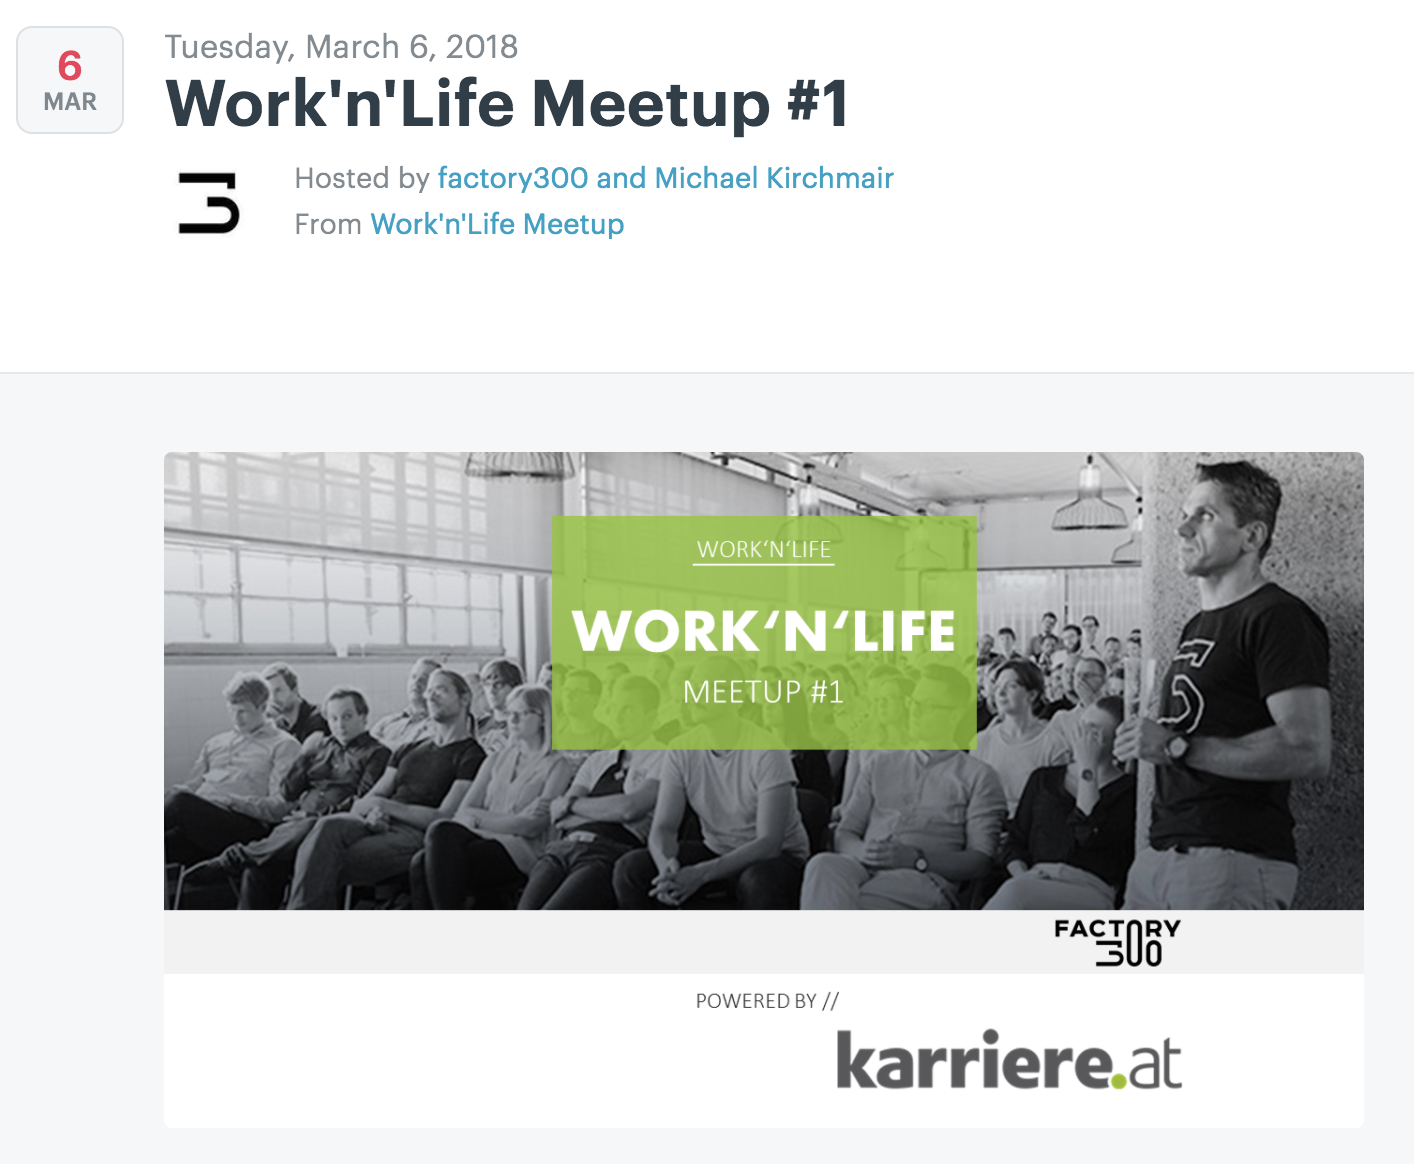 Work-n-life